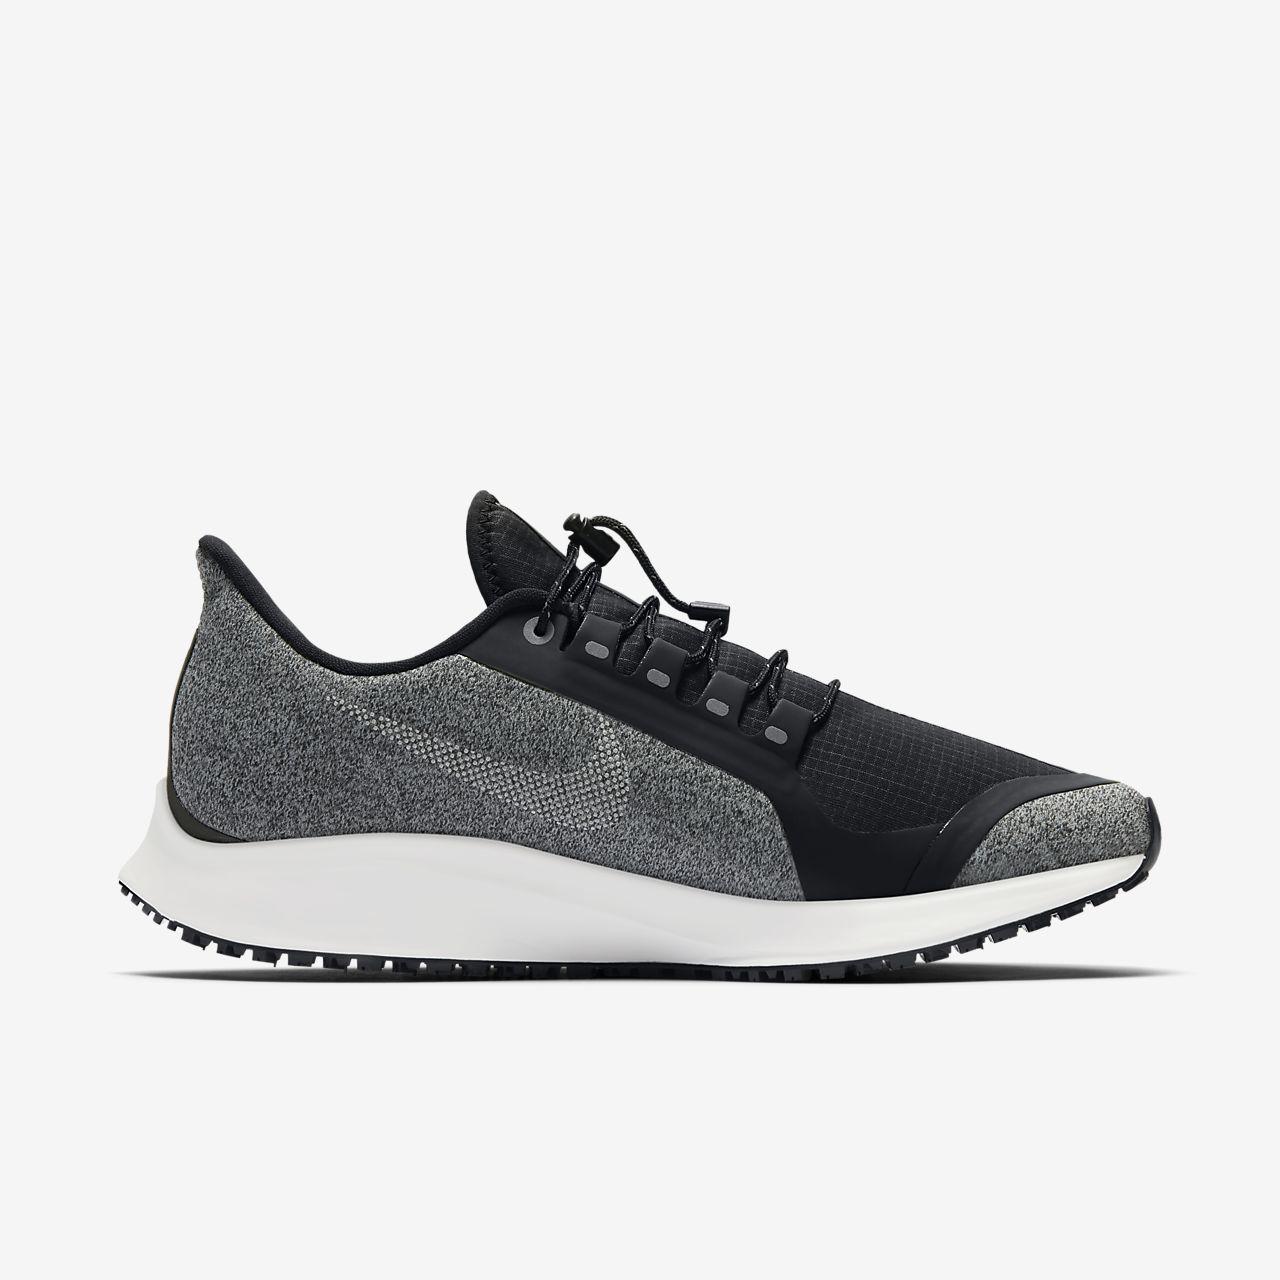 3d3e3a663 ... Nike Air Zoom Pegasus 35 Shield Water-Repellent Zapatillas de running -  Mujer